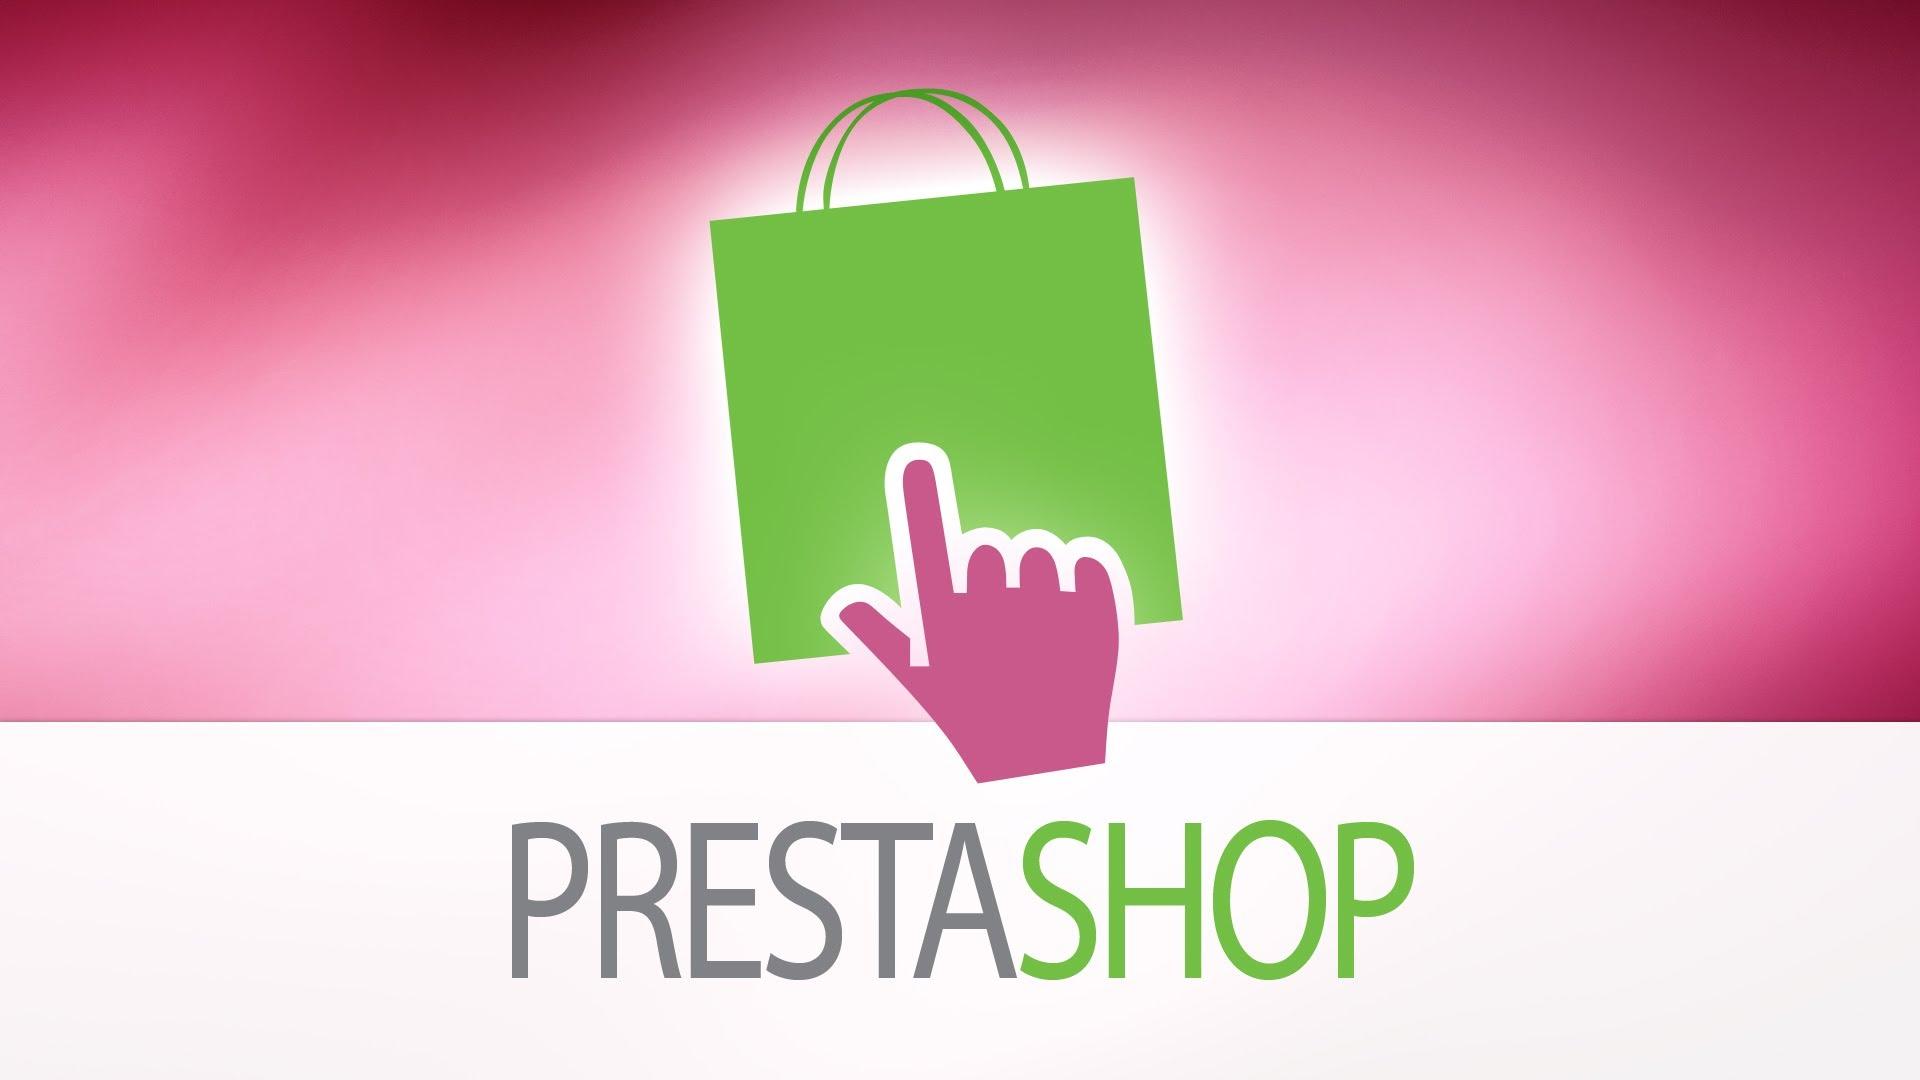 Prestahop - Home Business Website Development